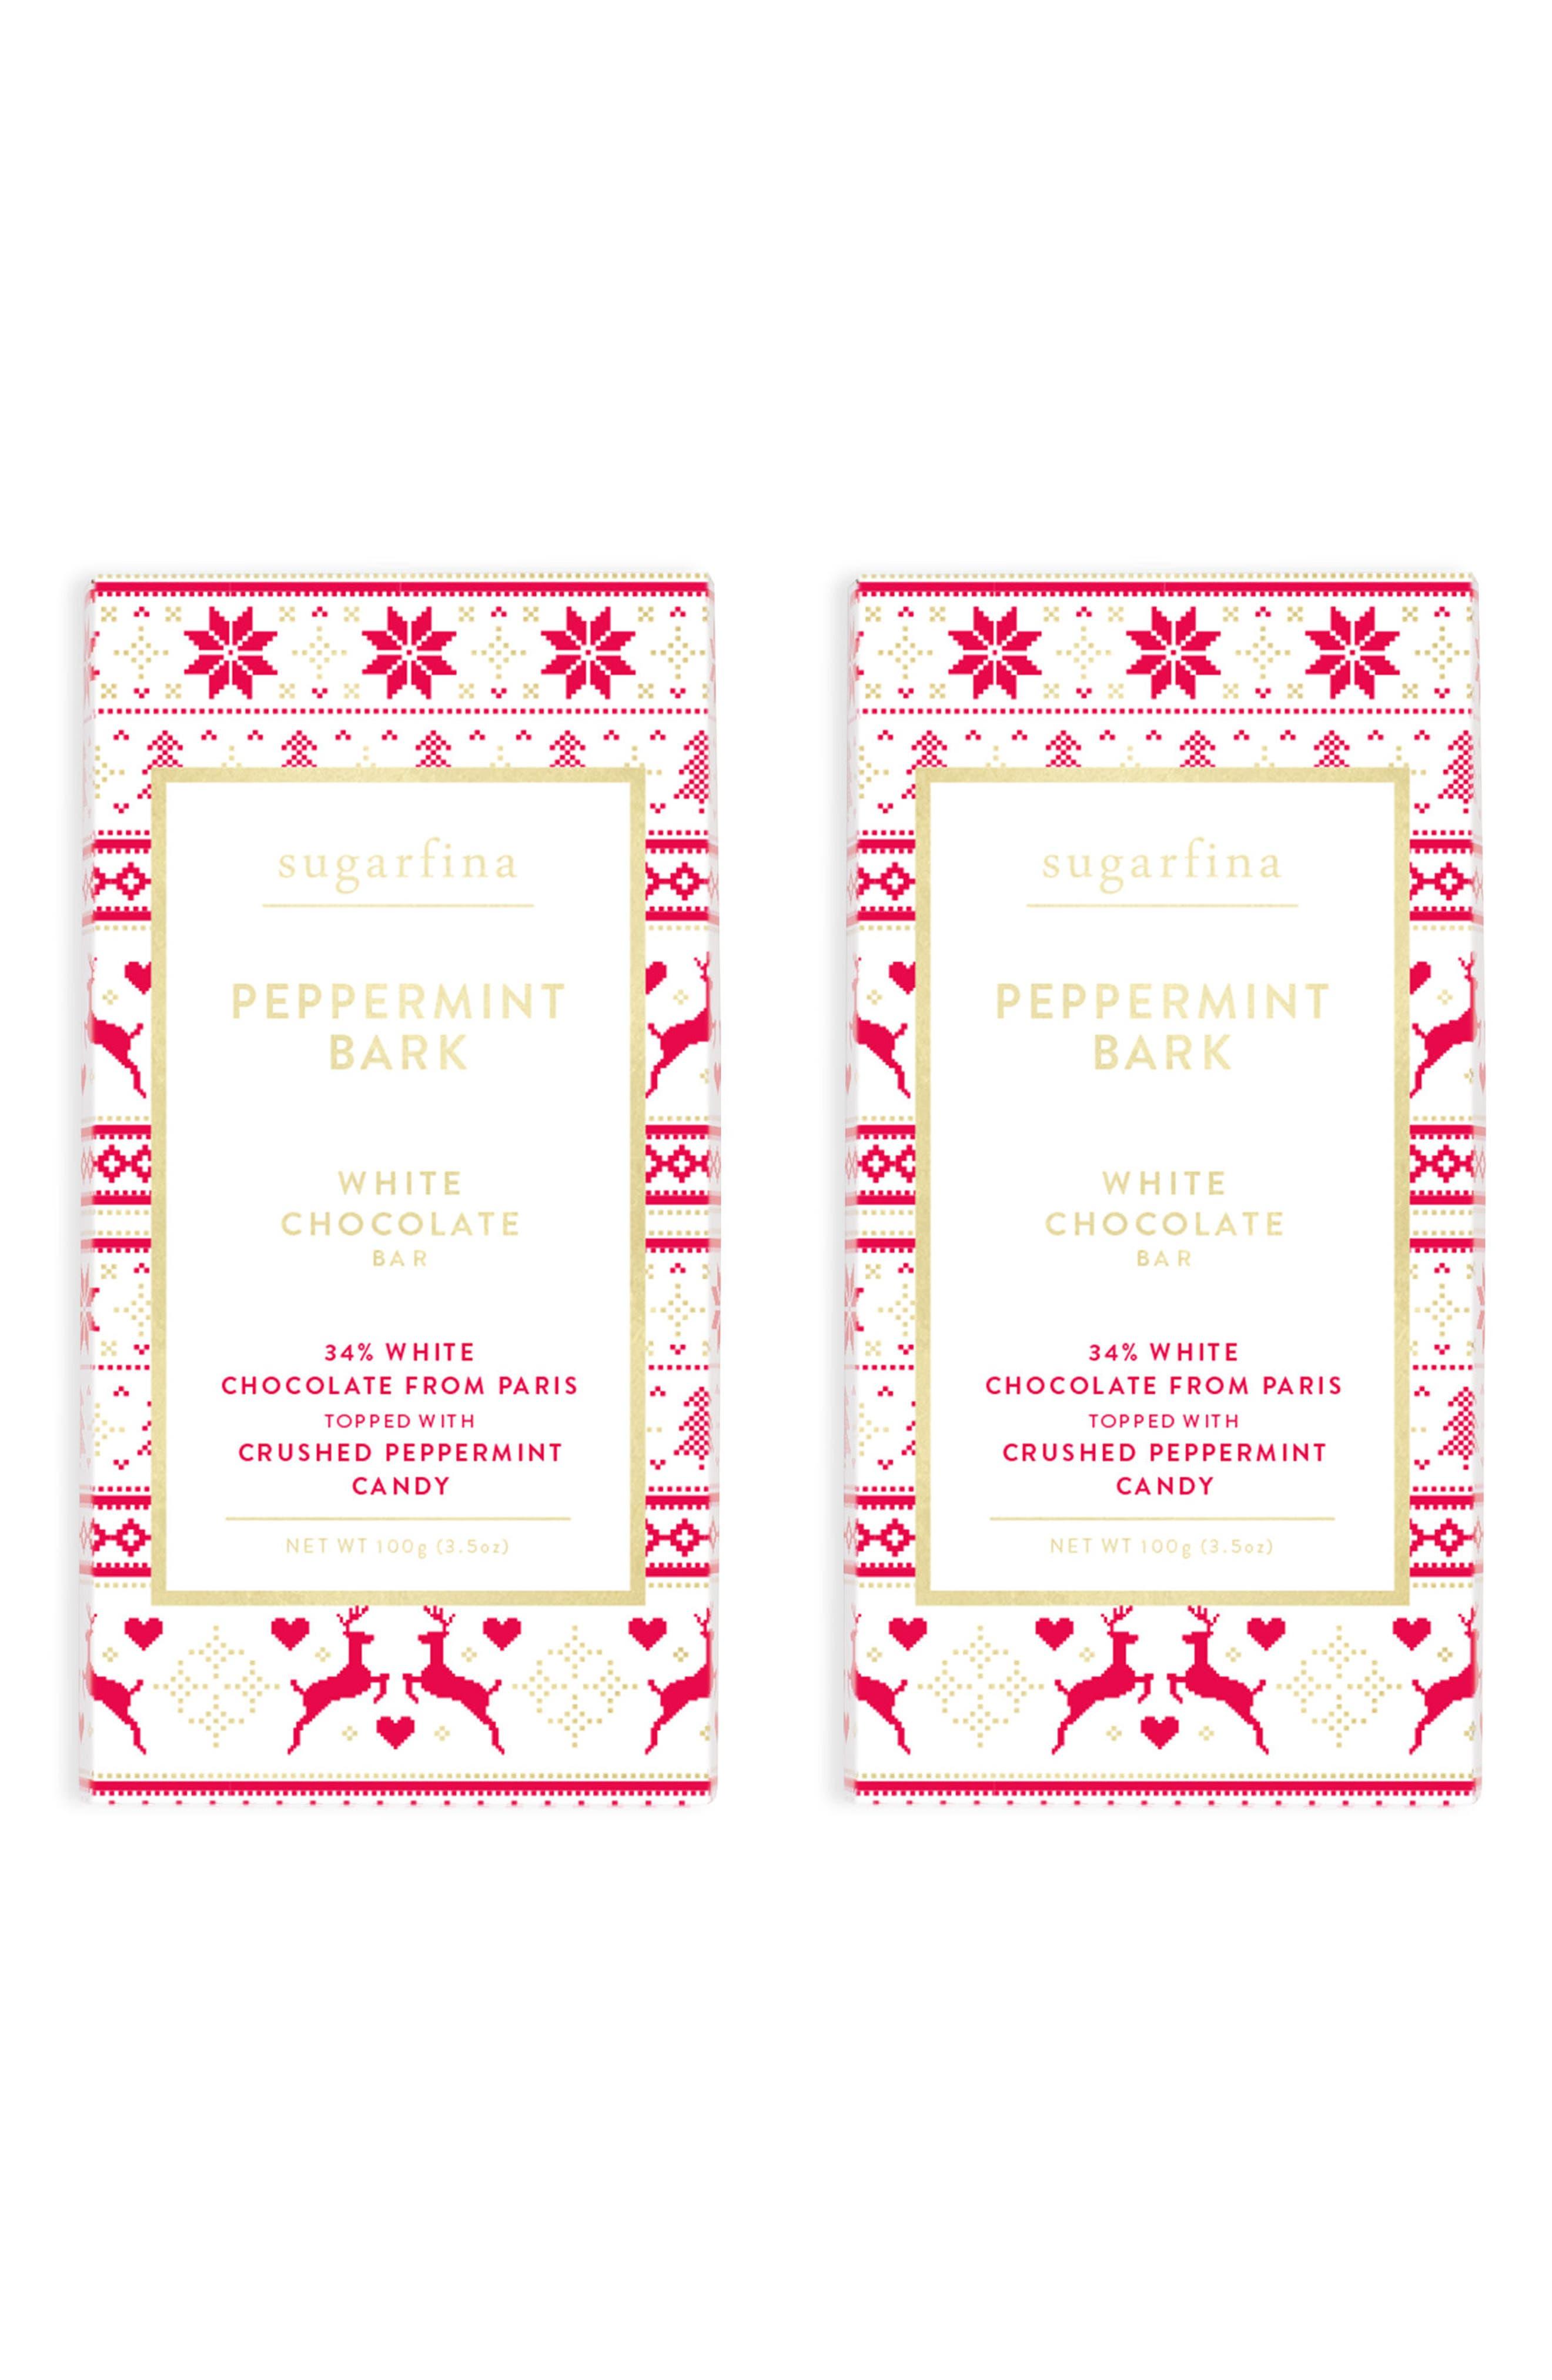 sugarfina Set of 2 White Chocolate Peppermint Bark Chocolate Bar